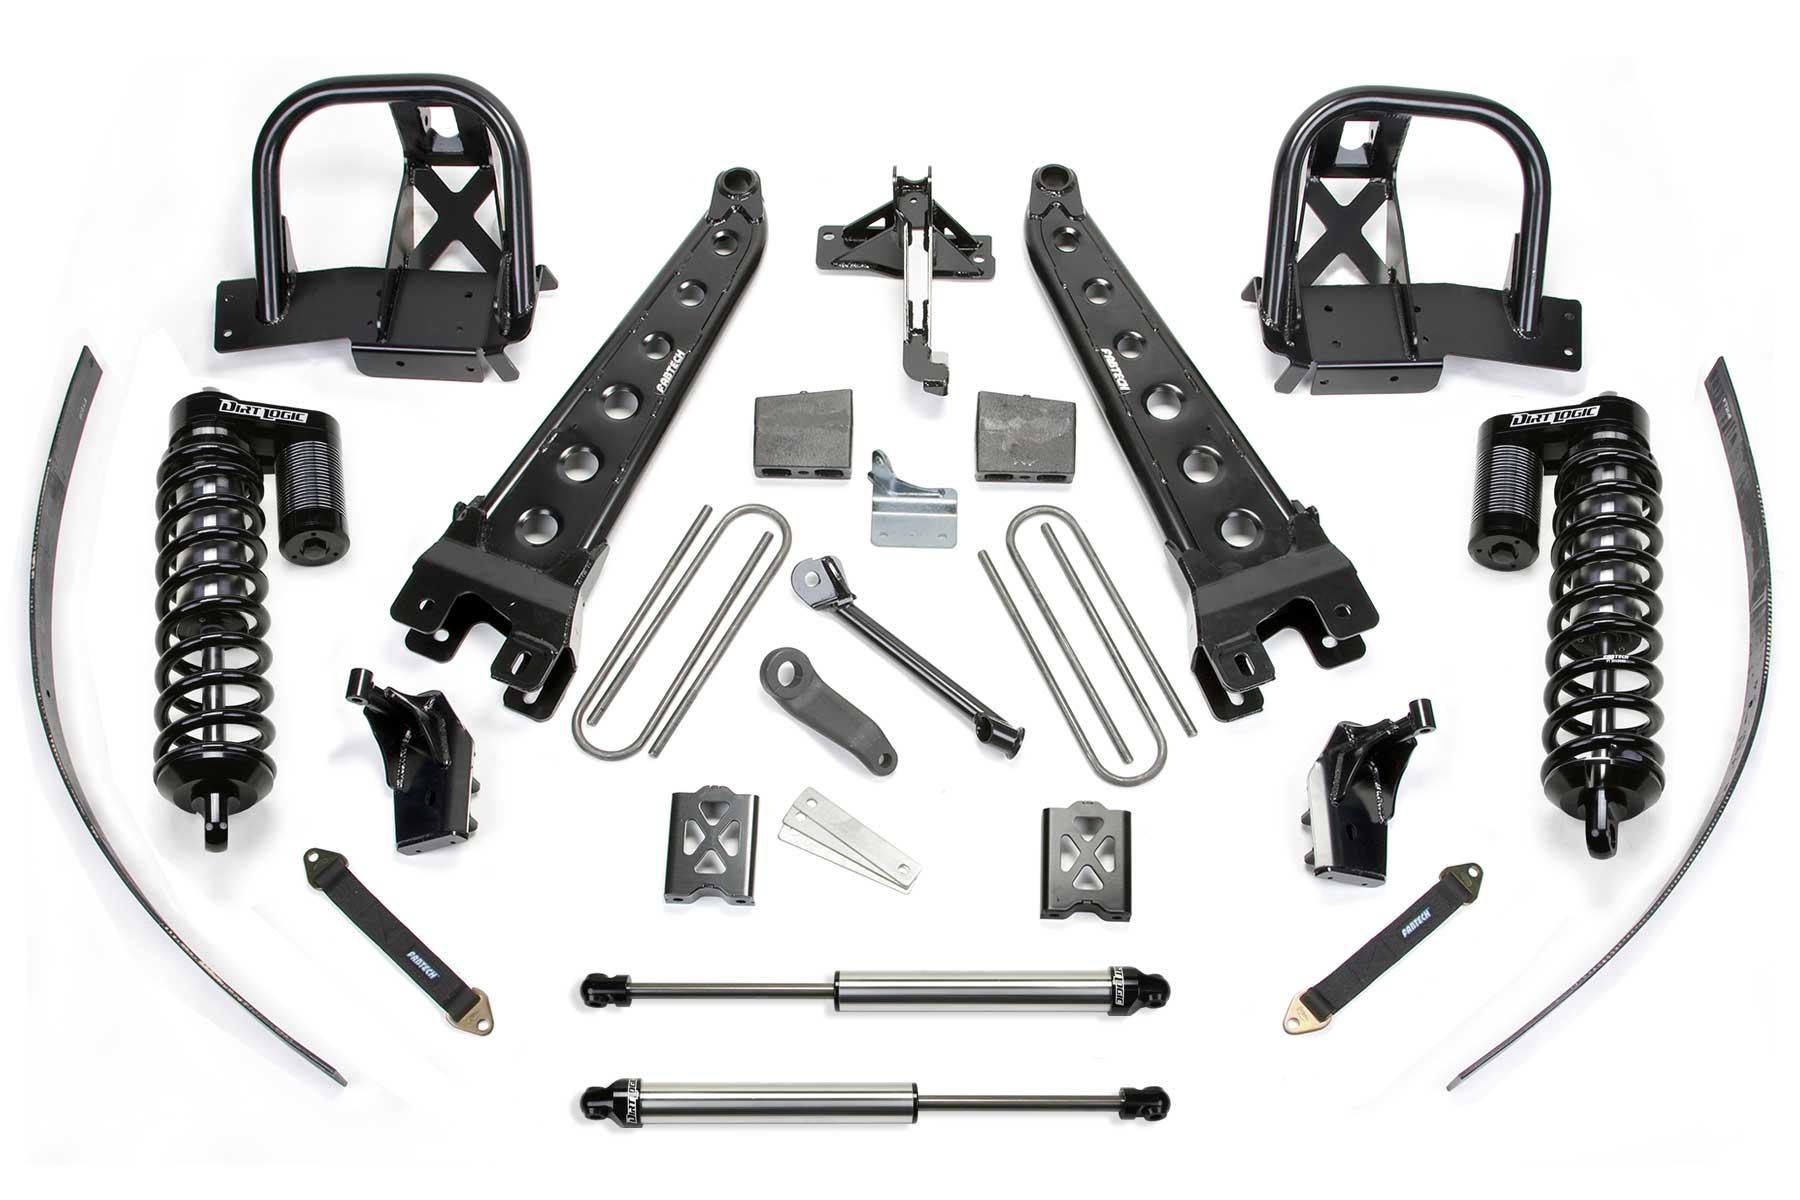 8 Radius Arm System W Dirt Logic 4 0 Coilovers Amp Rear Dirt Logic Shocks